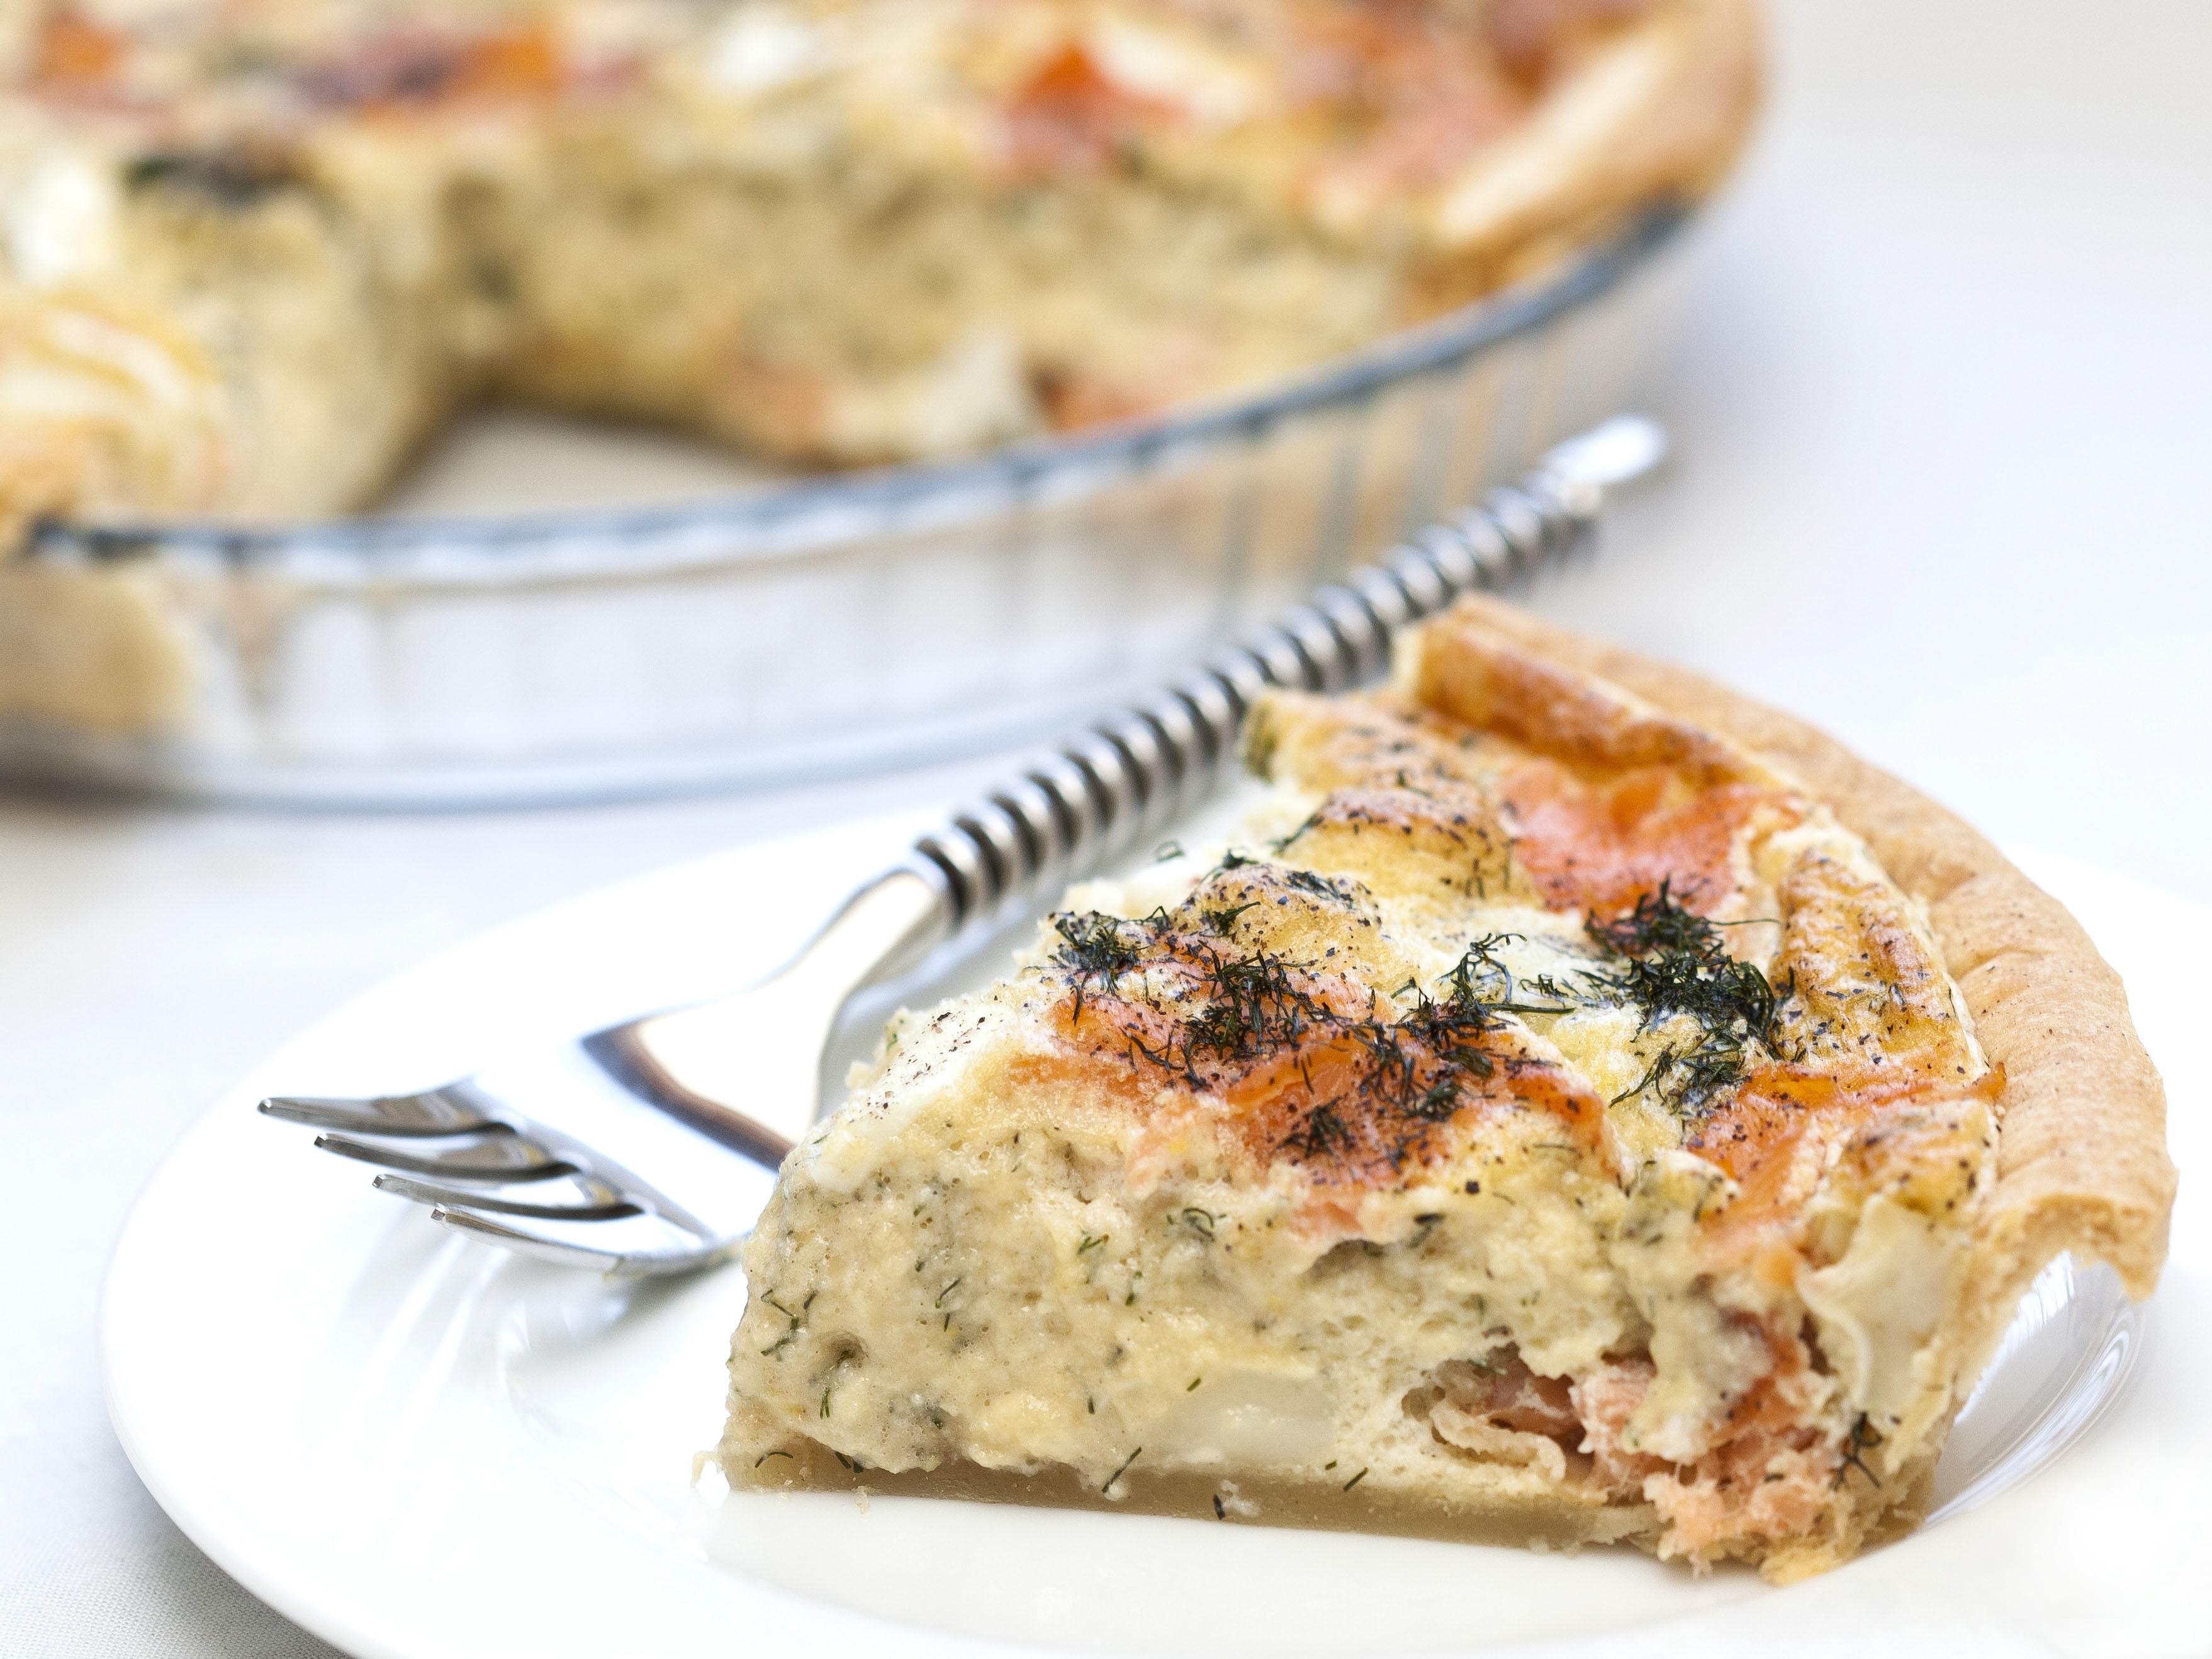 Smoked Salmon & Goat's Cheese Souffle Tart | Susan Orr Photography